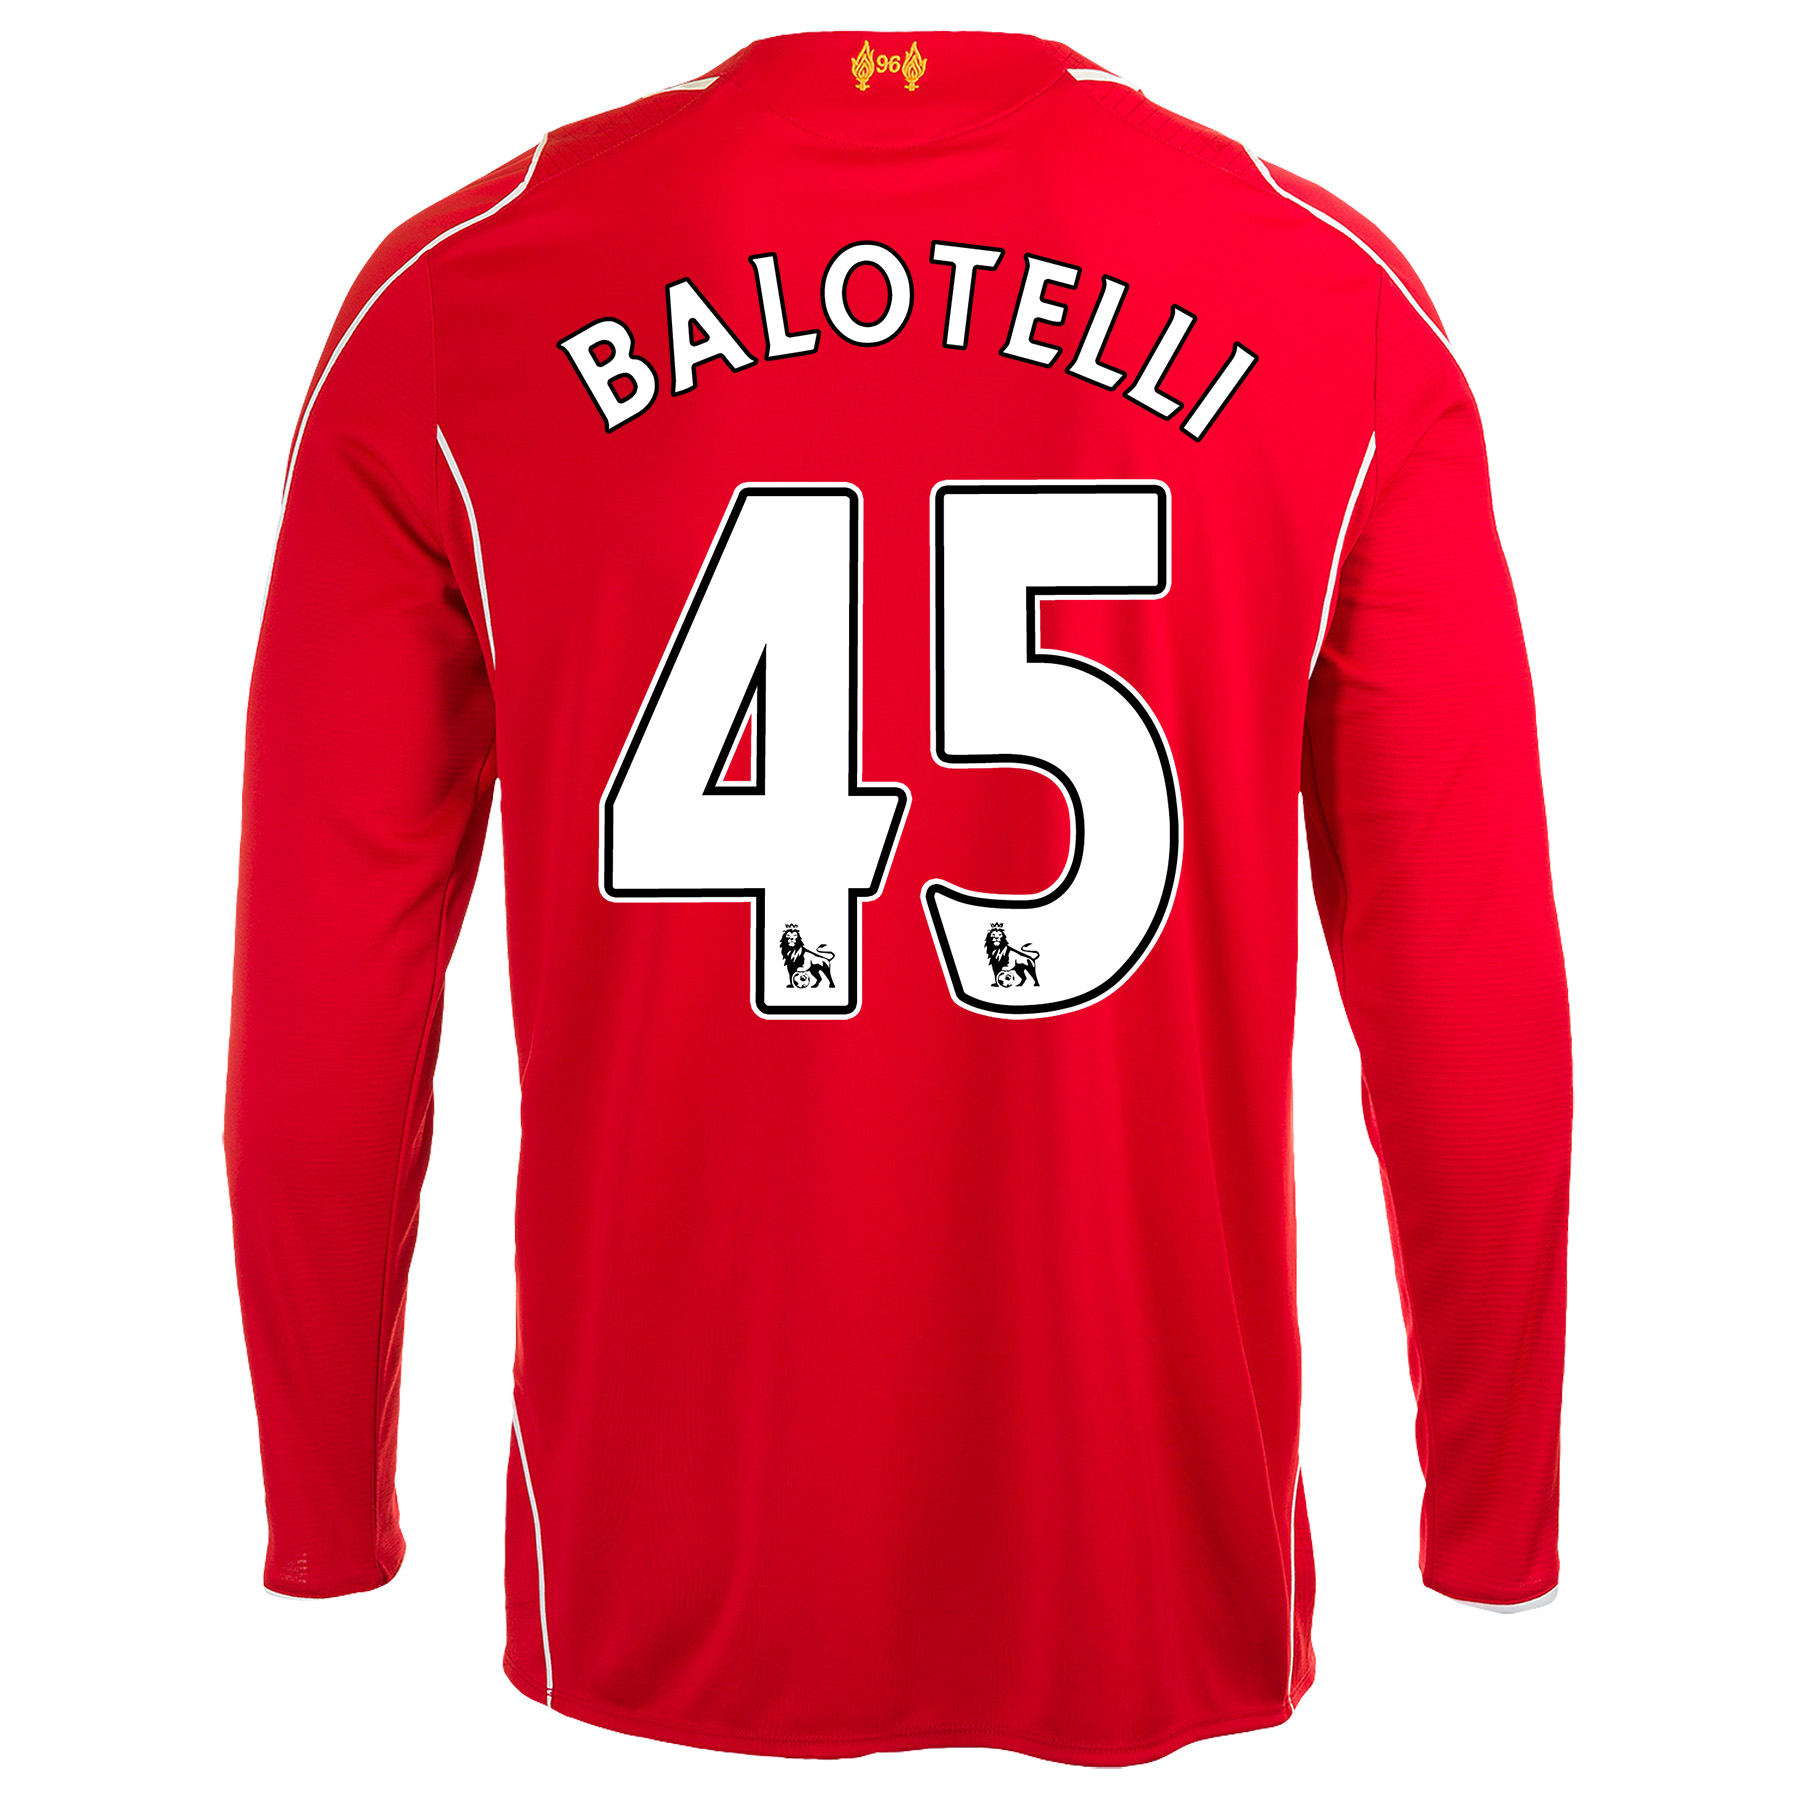 Liverpool Home Shirt 2014/15 Long Sleeve - Kids with Balotelli 45 printing